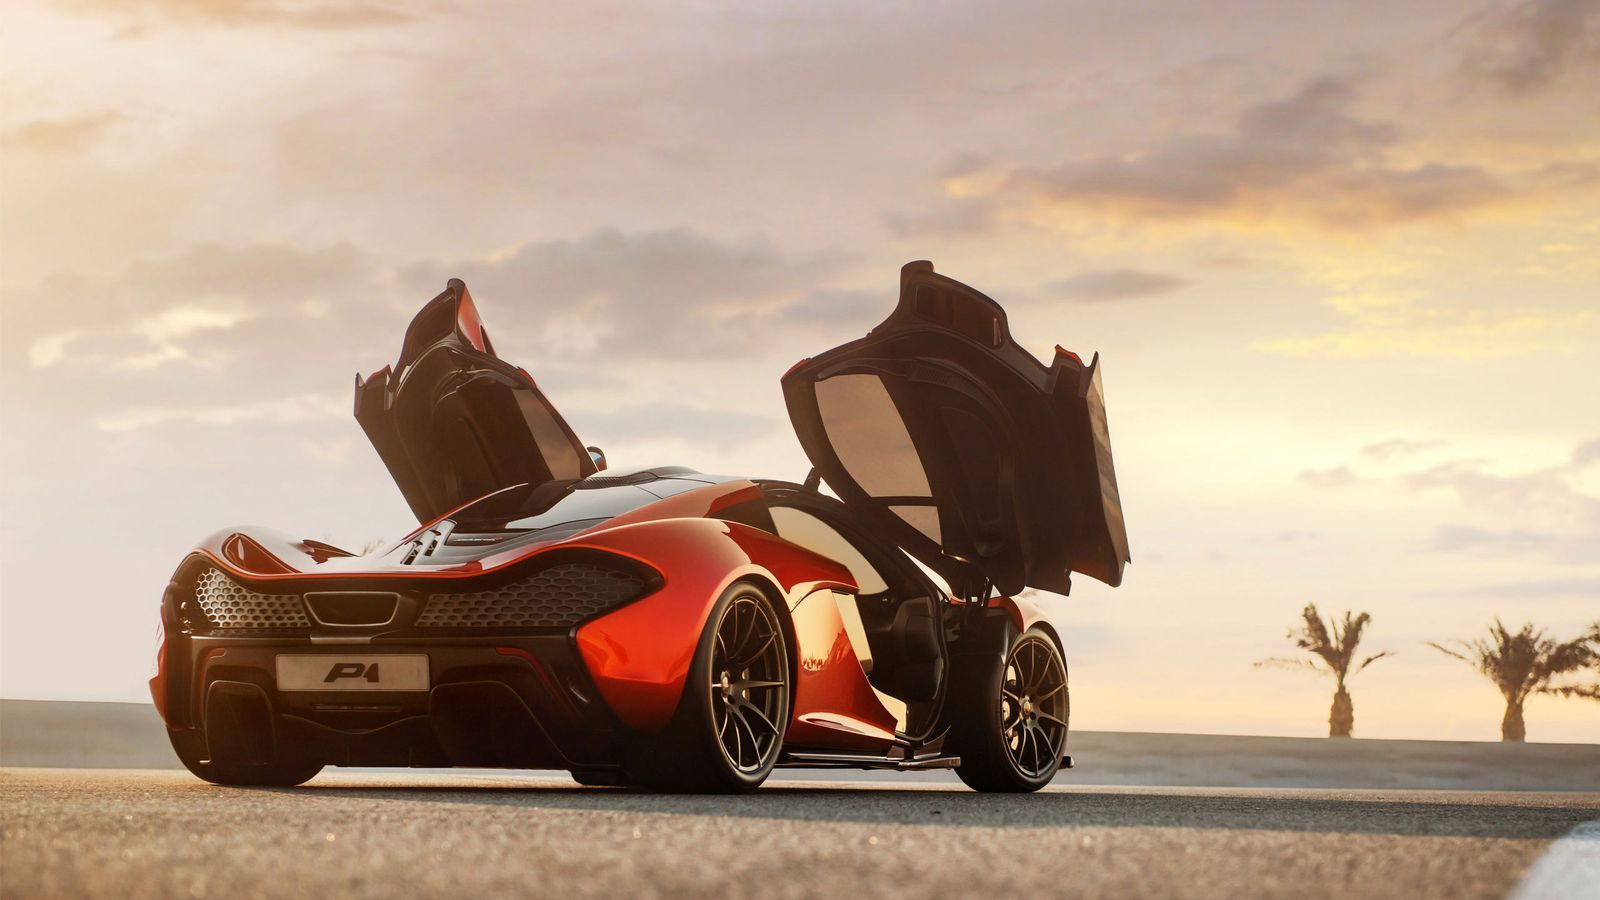 McLaren Supercar Wallpaper Download 49720